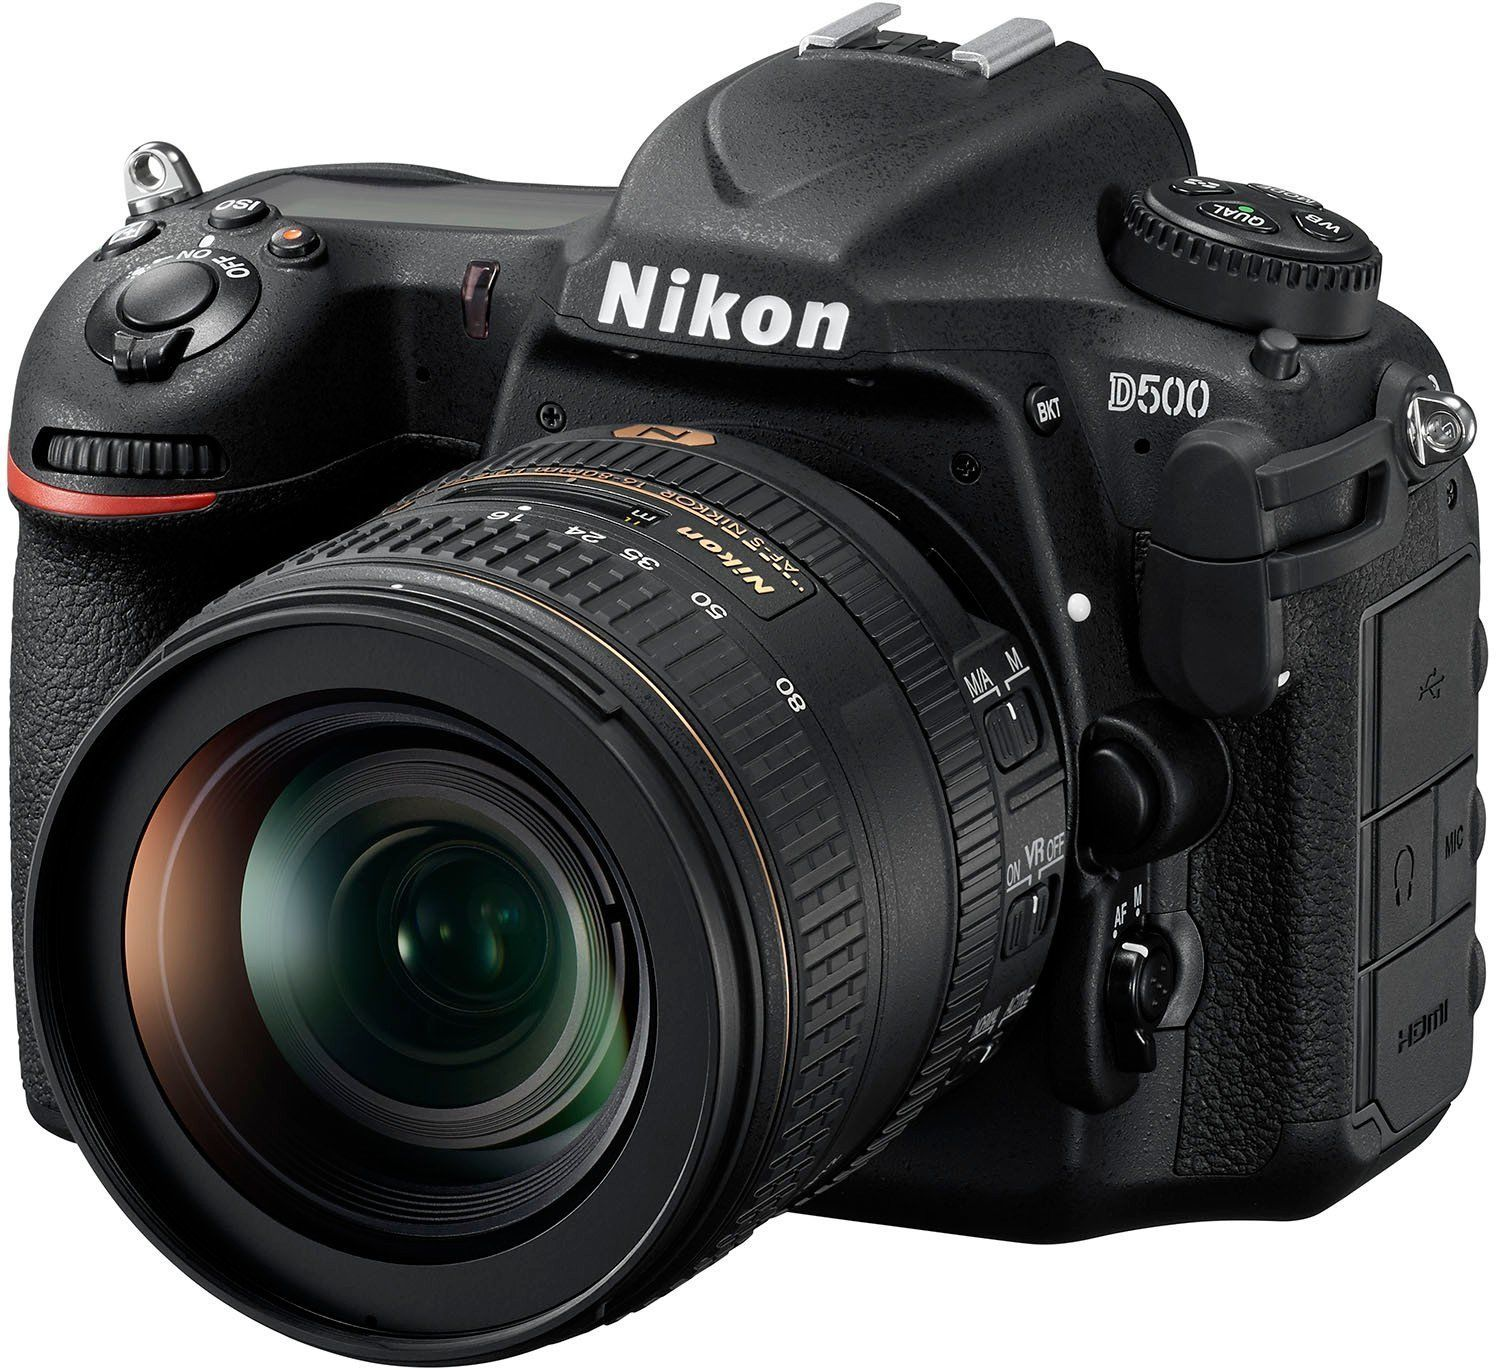 Nikon D500 + Nikkor AF-S DX 16-80mm 1:2;8-4 E VR ED 4K-UHD-Video 20.9 Megapixel